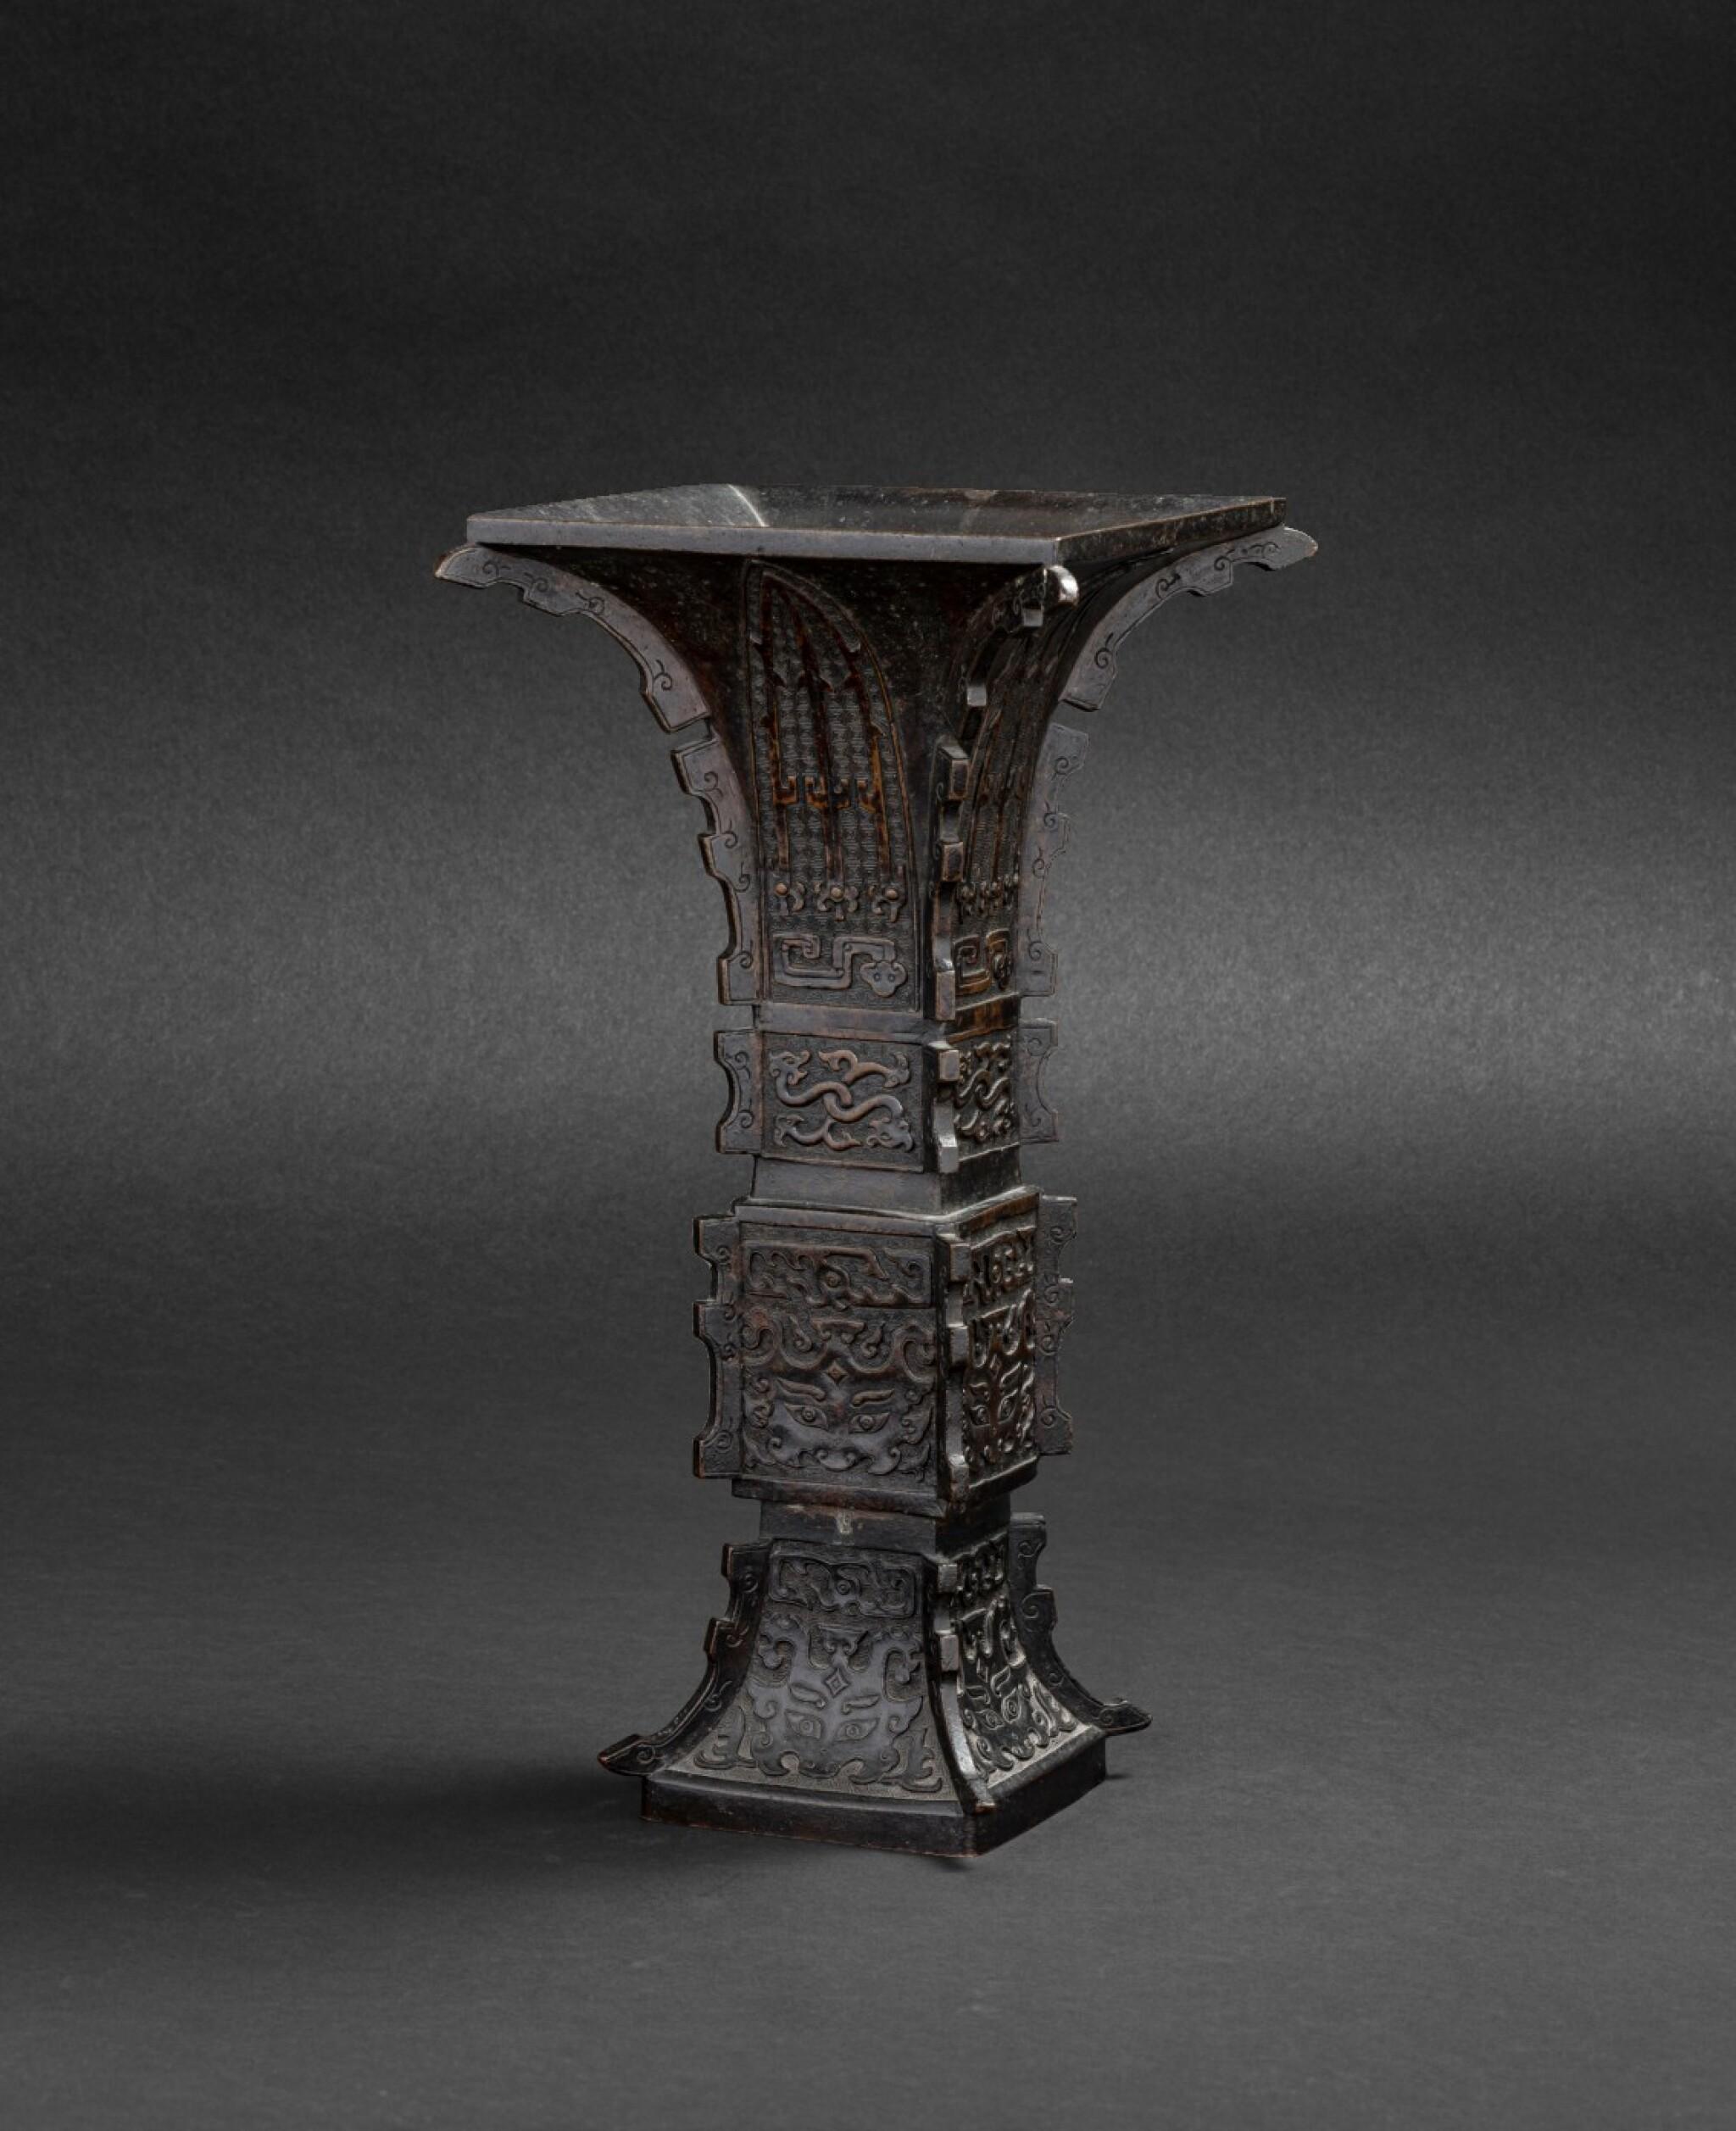 View 1 of Lot 79. Vase archaïsant en bronze patiné, gu Dynastie Qing, XVIIIE siècle | 清十八世紀 銅仿古紋出戟花觚 | A large bronze gu vase, Qing Dynasty, 18th century.